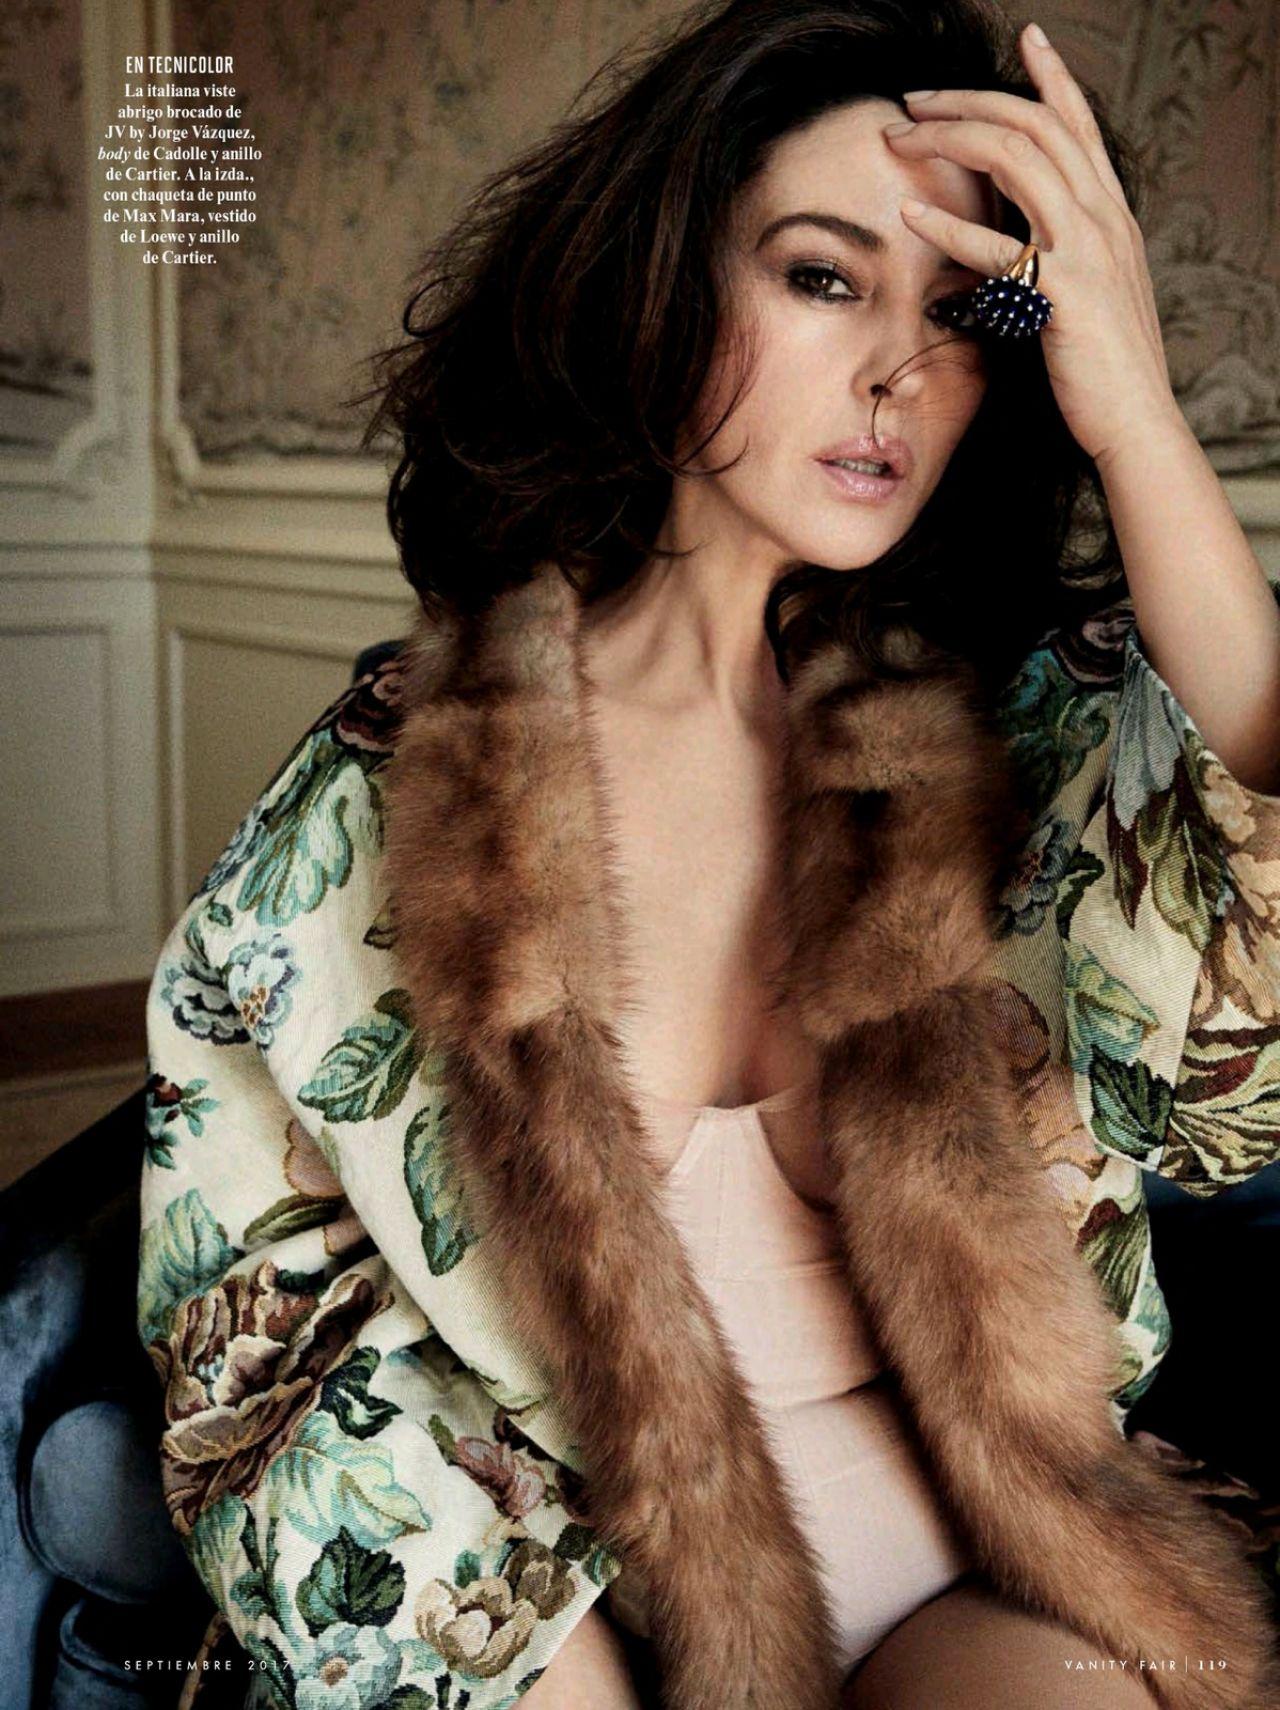 monica bellucci nude vanity fair magazine jpg 422x640